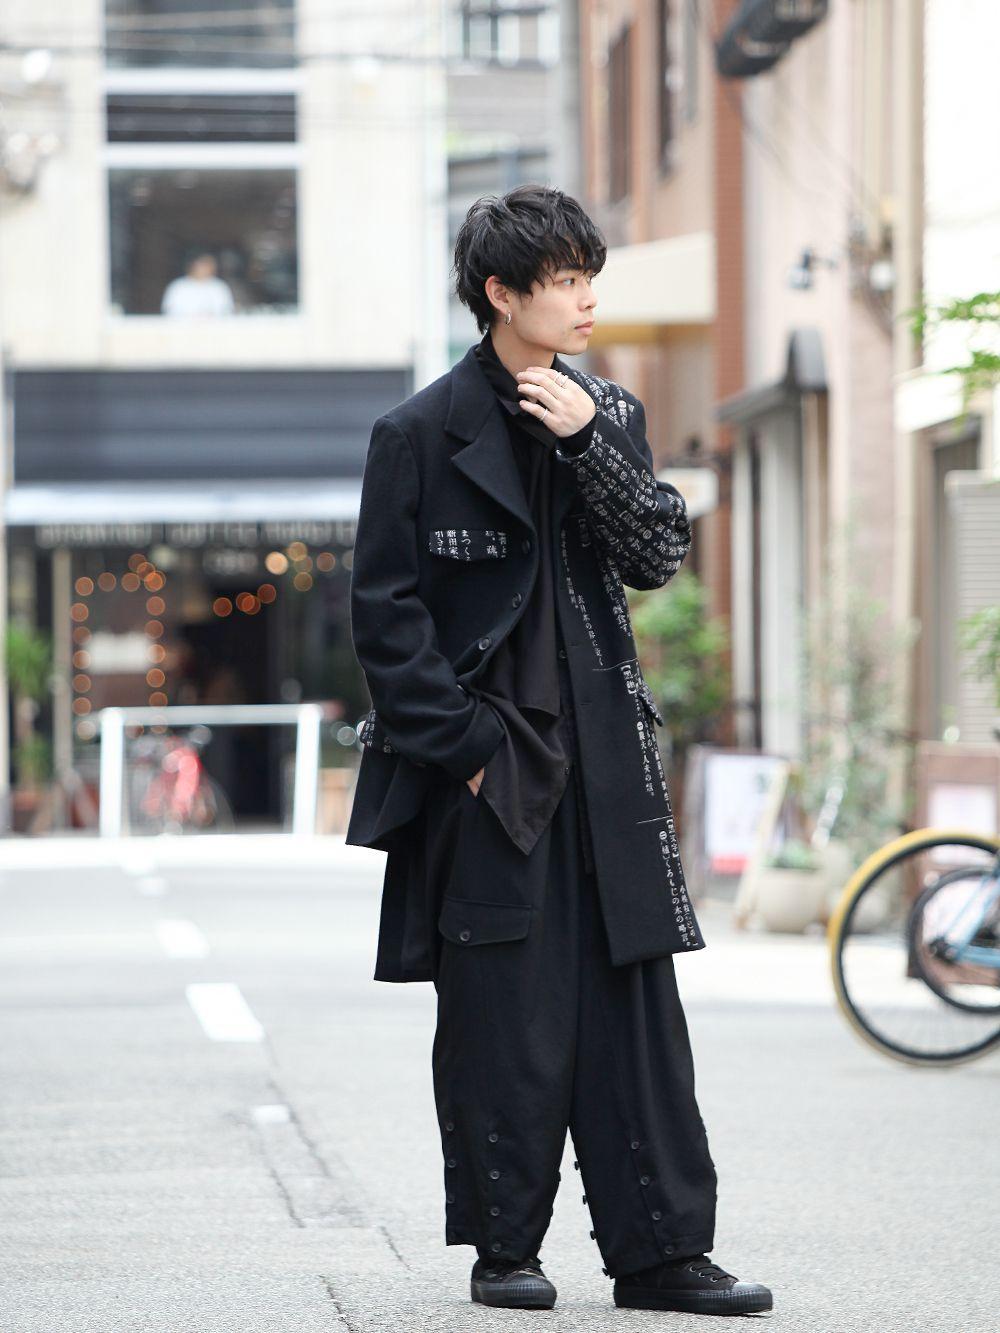 Yohji Yamamoto Asymmetry Dictionary Jacket Style - 4-001